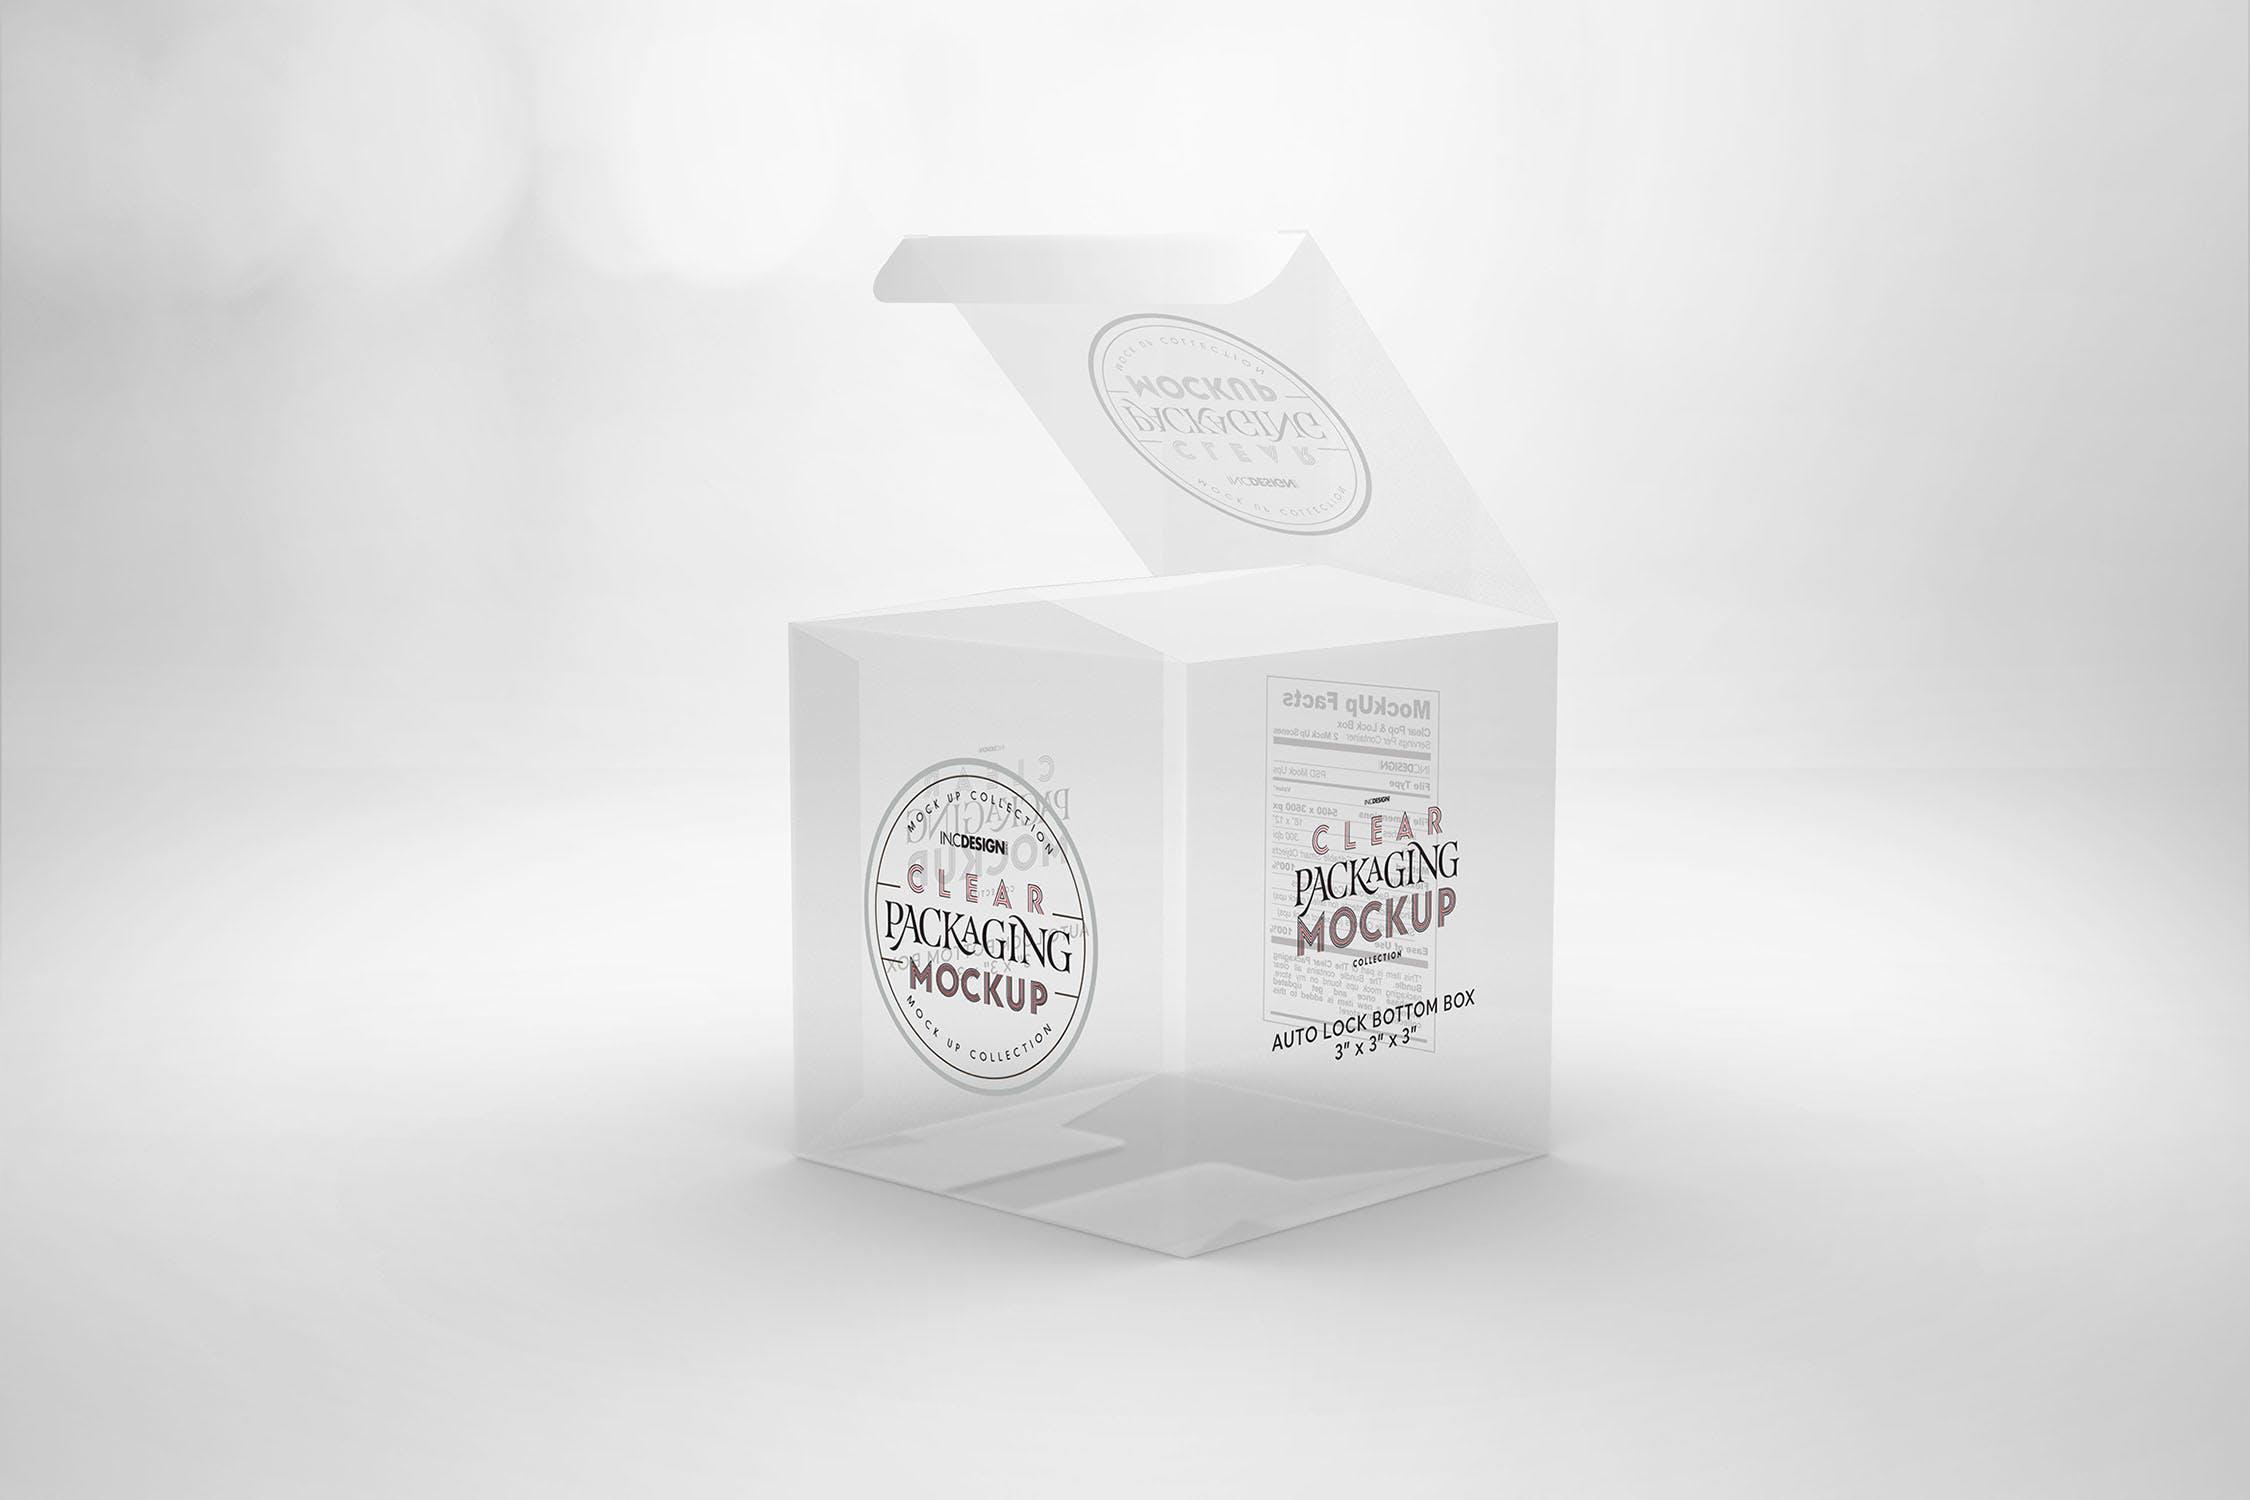 透明包装样机模板展示样机素材Clear Lock Bottom Boxes Packaging Mockup